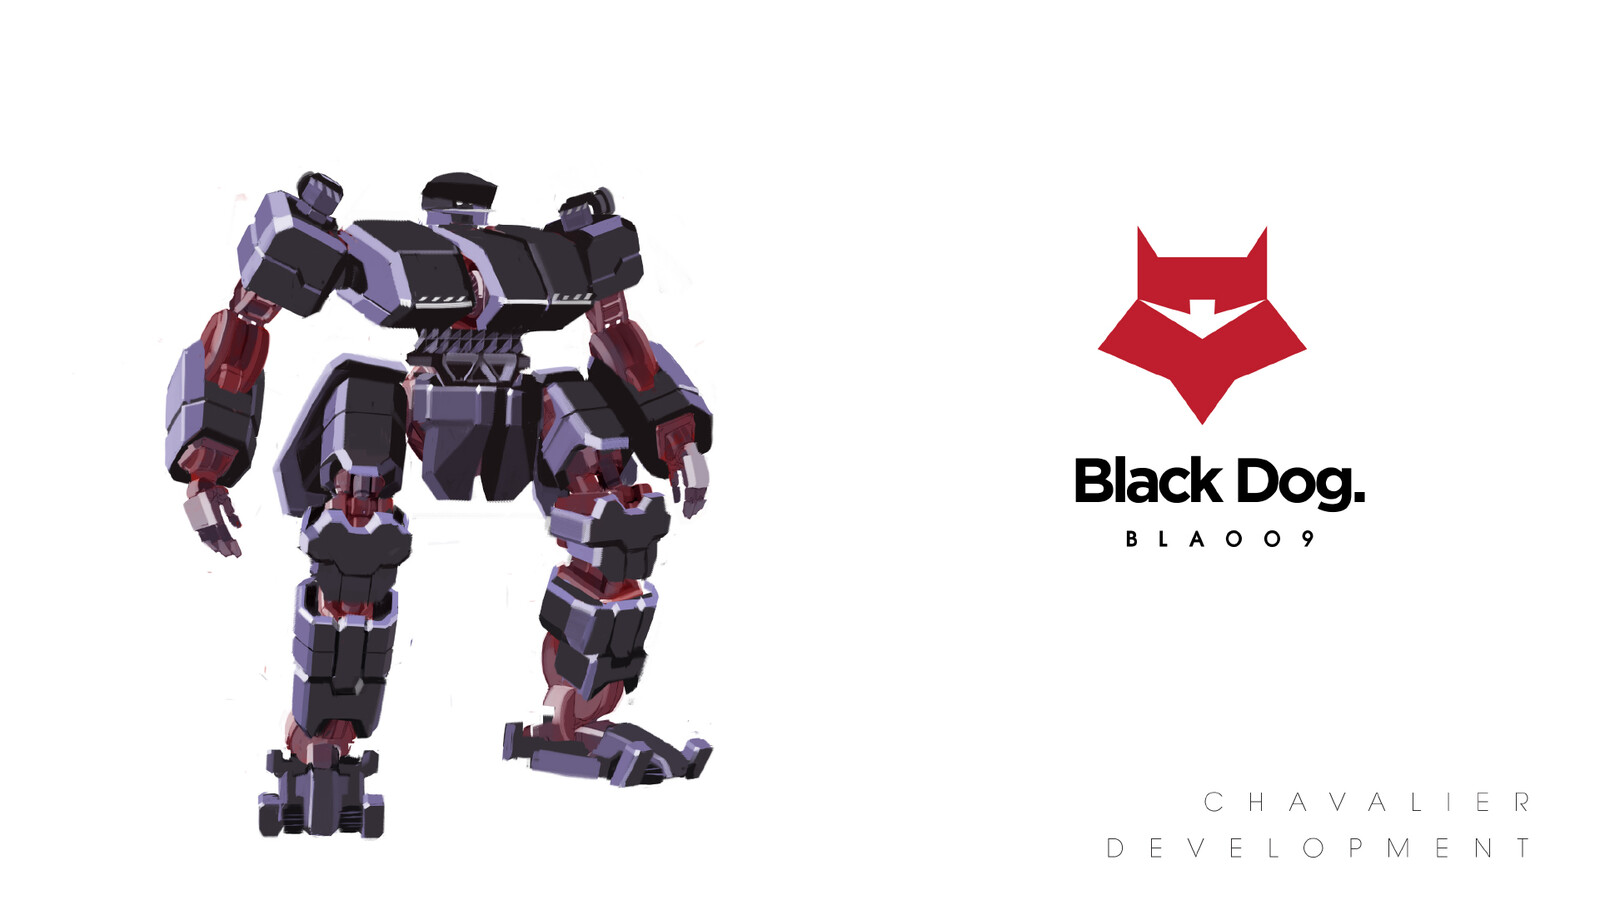 Alternate design for Black Dog